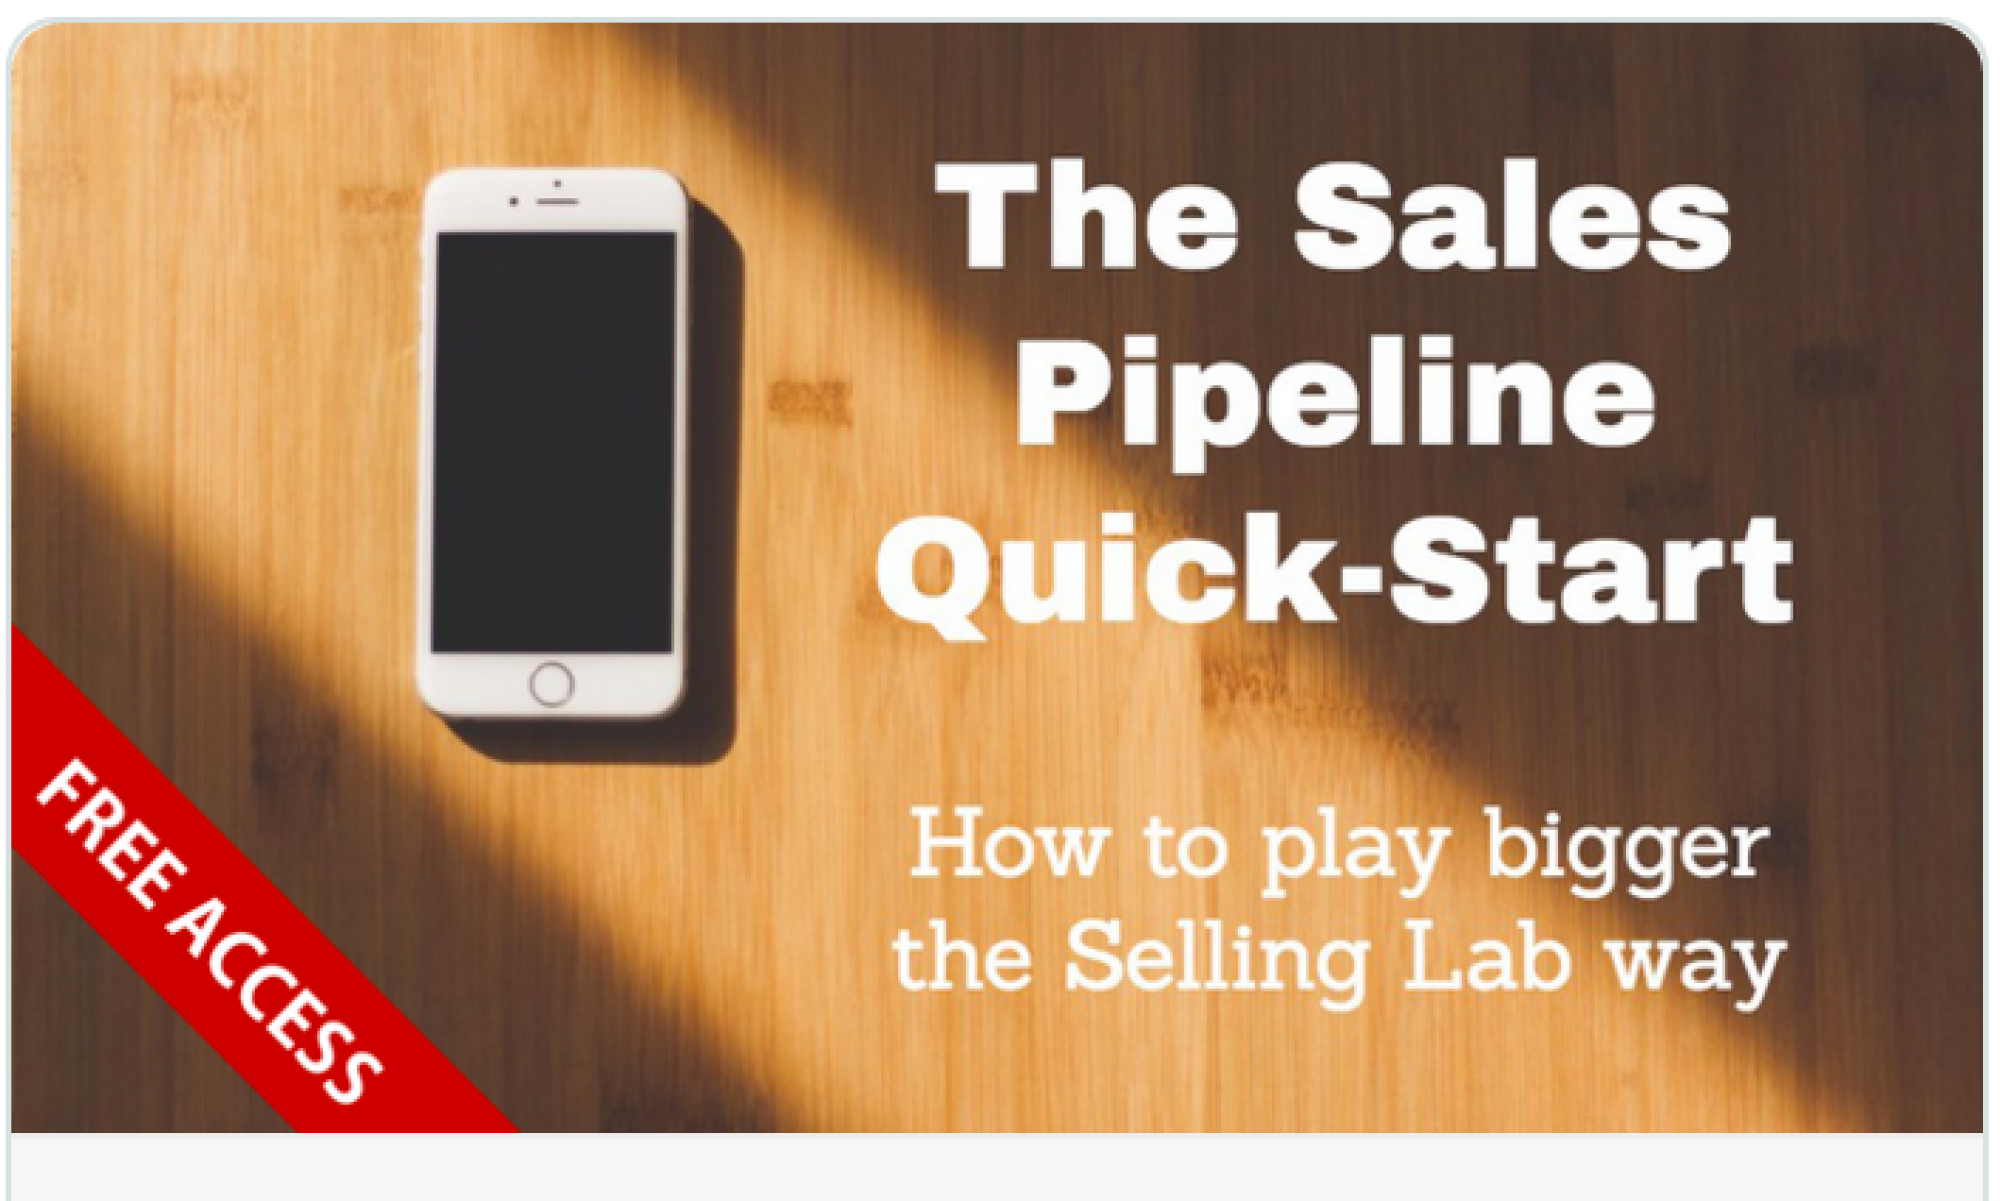 Selling Lab